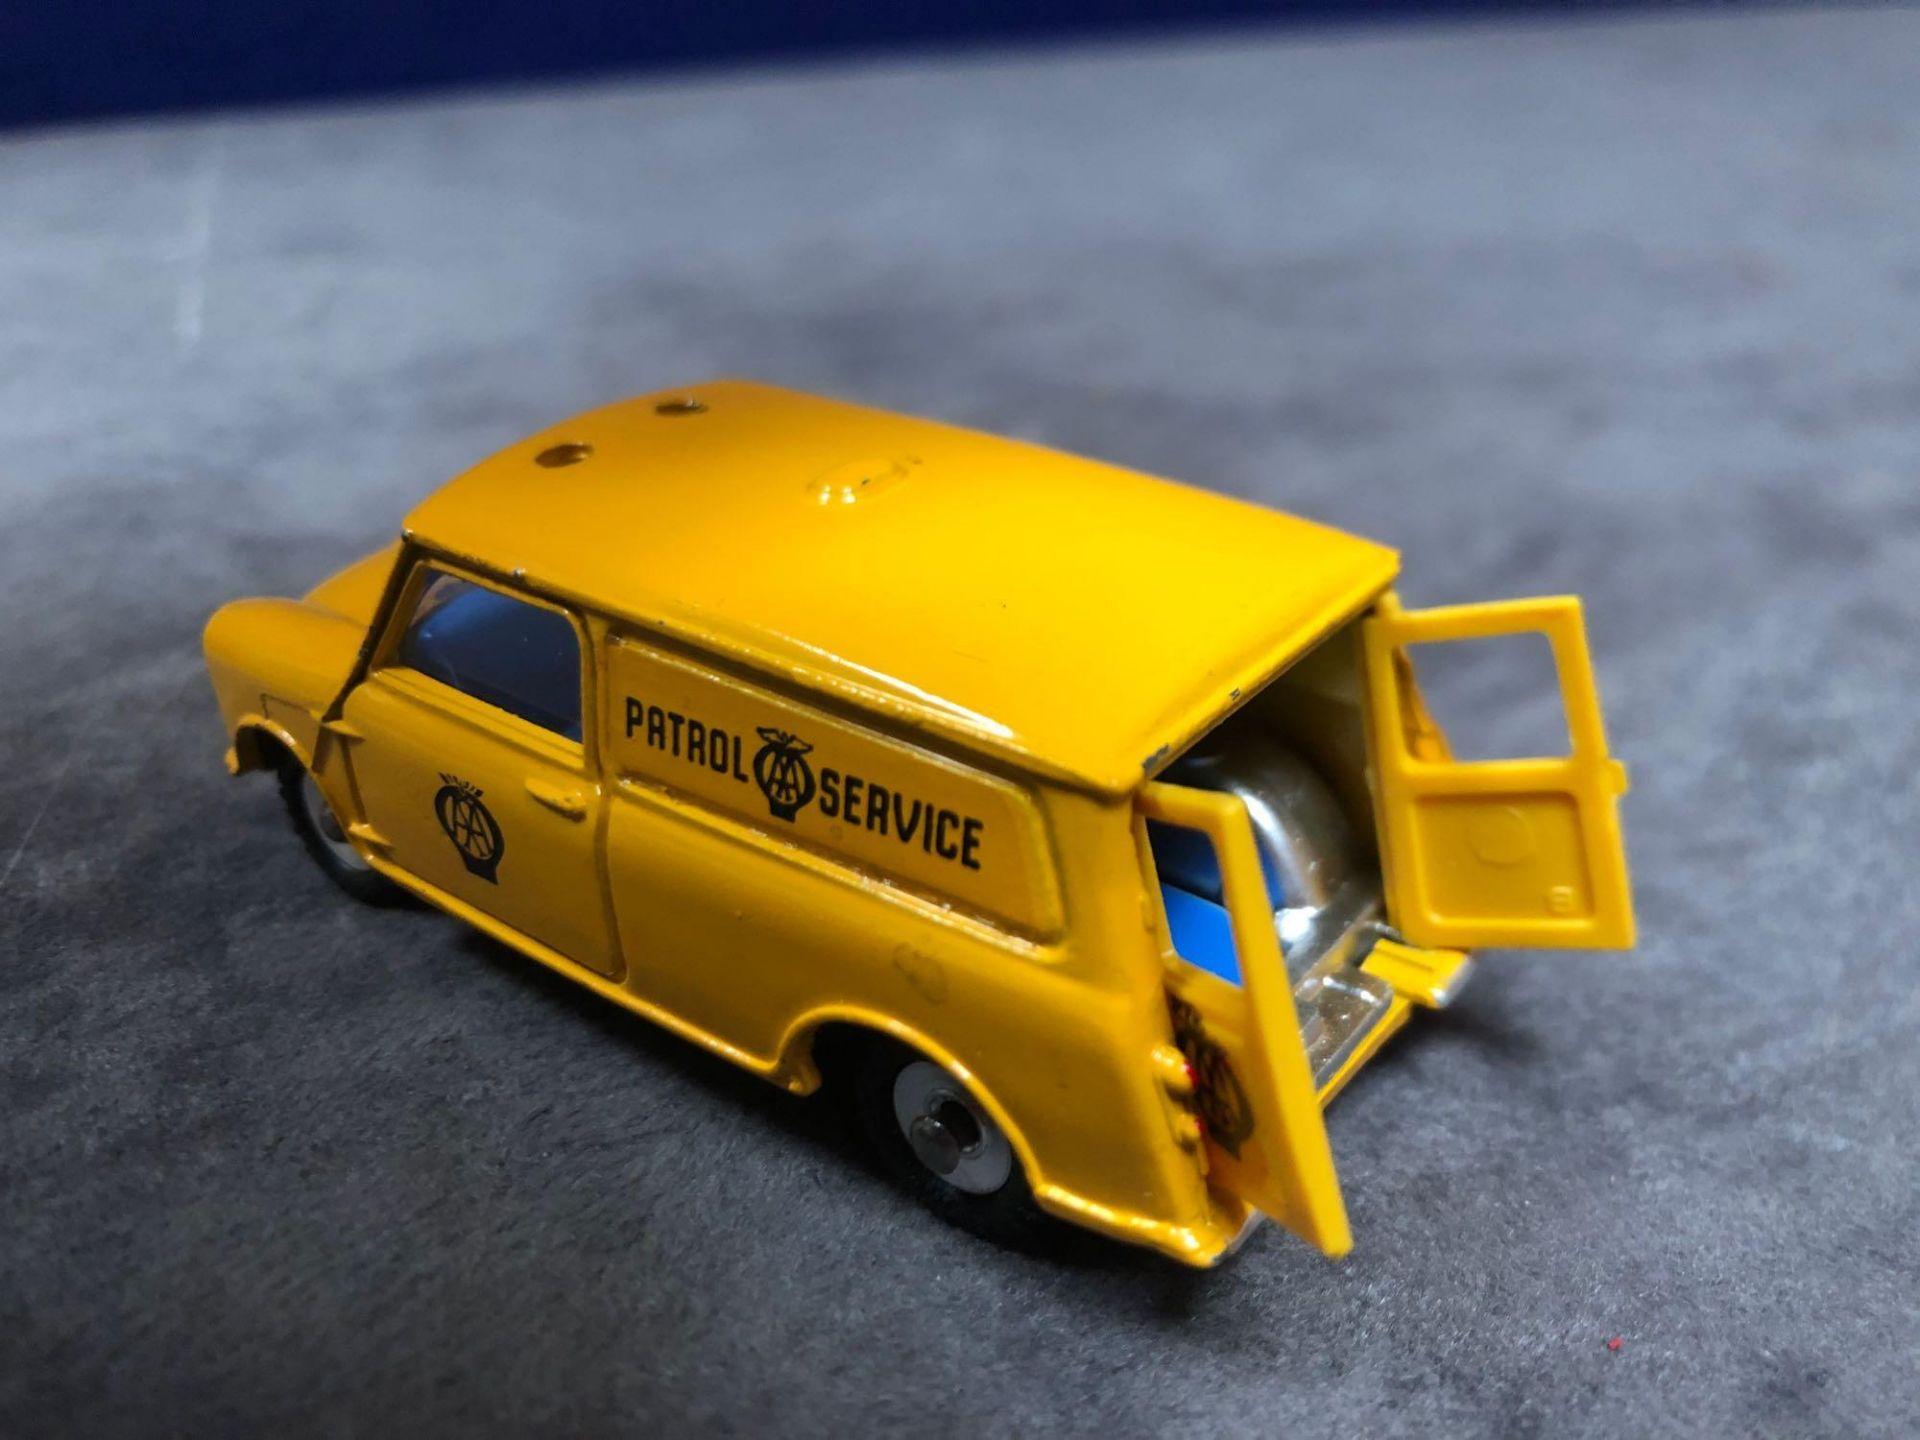 Dinky #274 AA Patrol Mini Van Yellow (AA Service) - Yellow Body And White Roof. AA Service To Van - Image 3 of 4